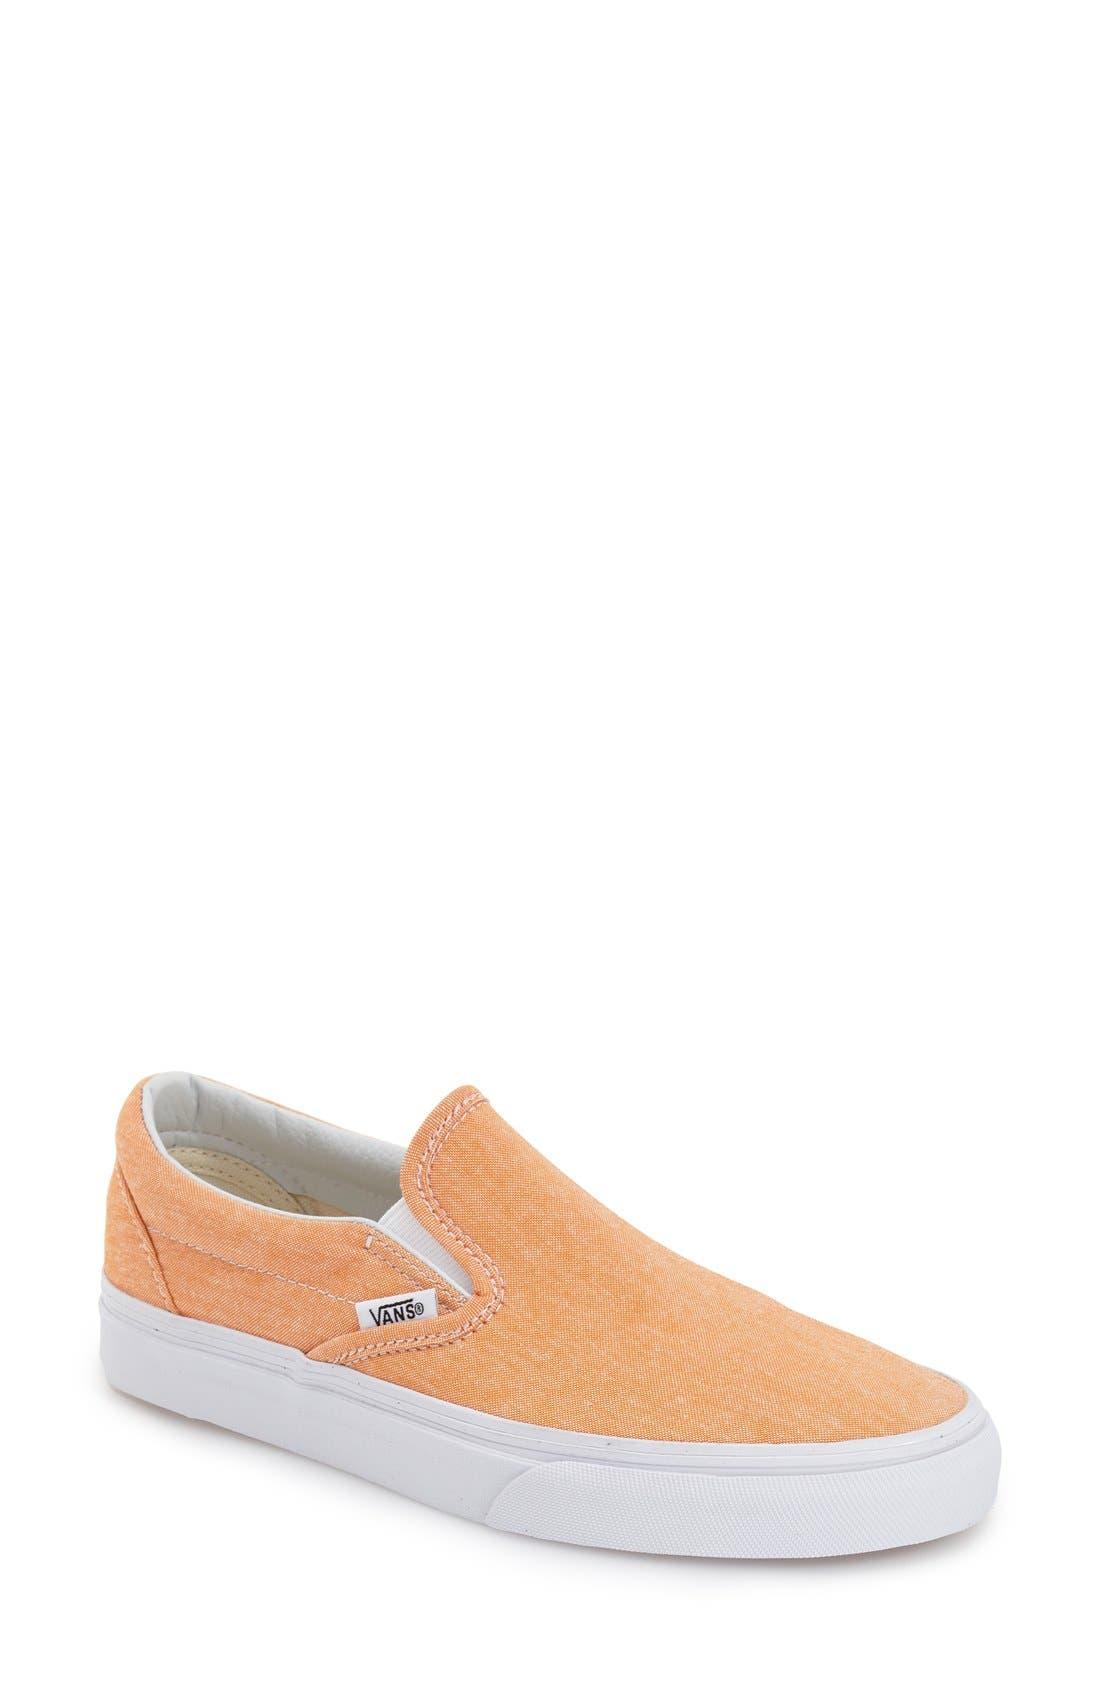 ,                             Classic Slip-On Sneaker,                             Main thumbnail 457, color,                             950